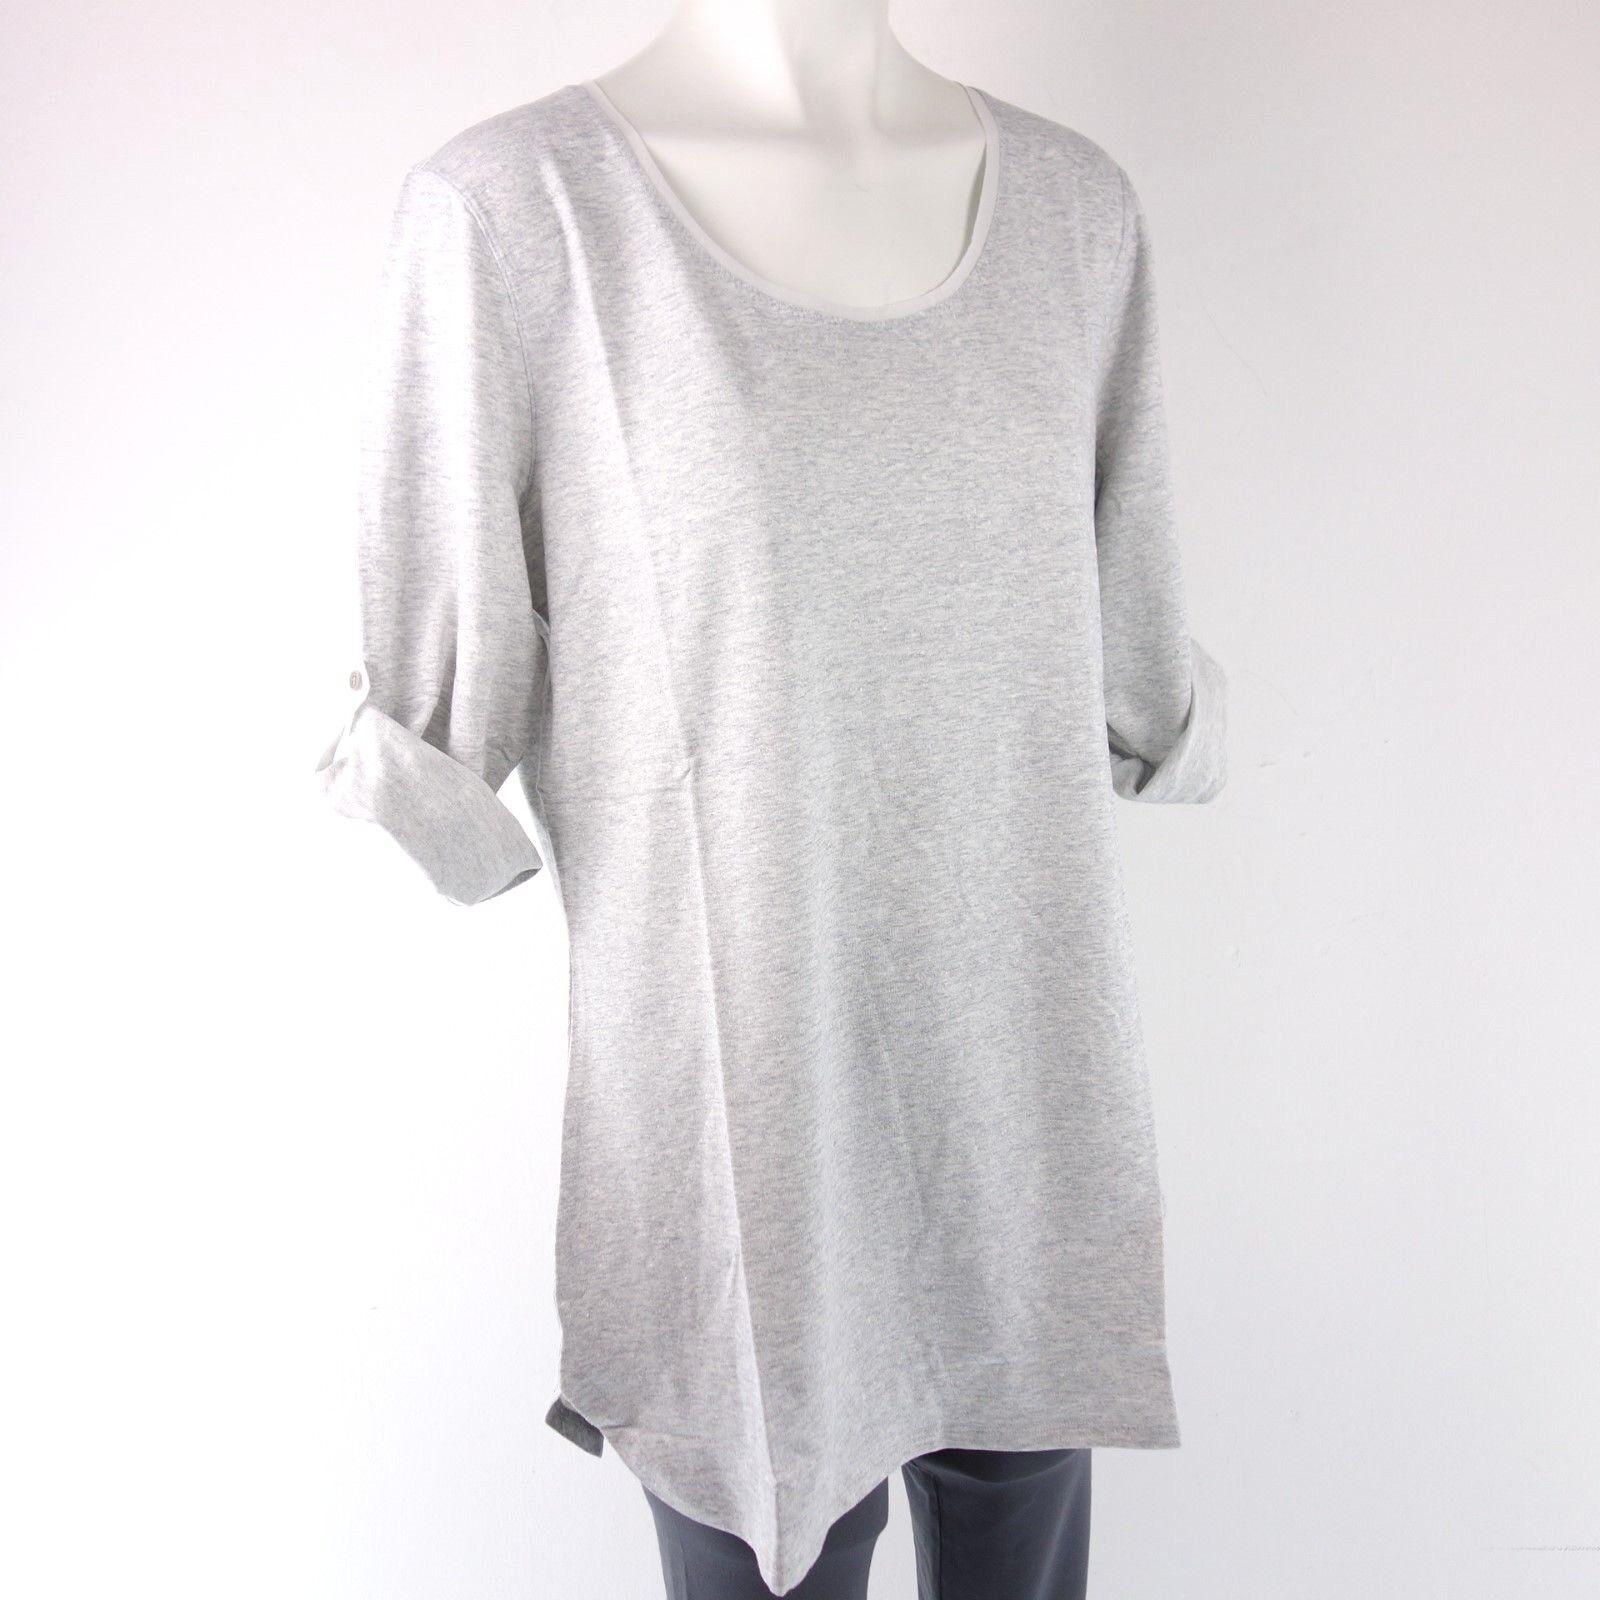 Le Jersey Perugia Women Shirt Size XL XXL 42 44 Grey Canvas Top Np 179 New